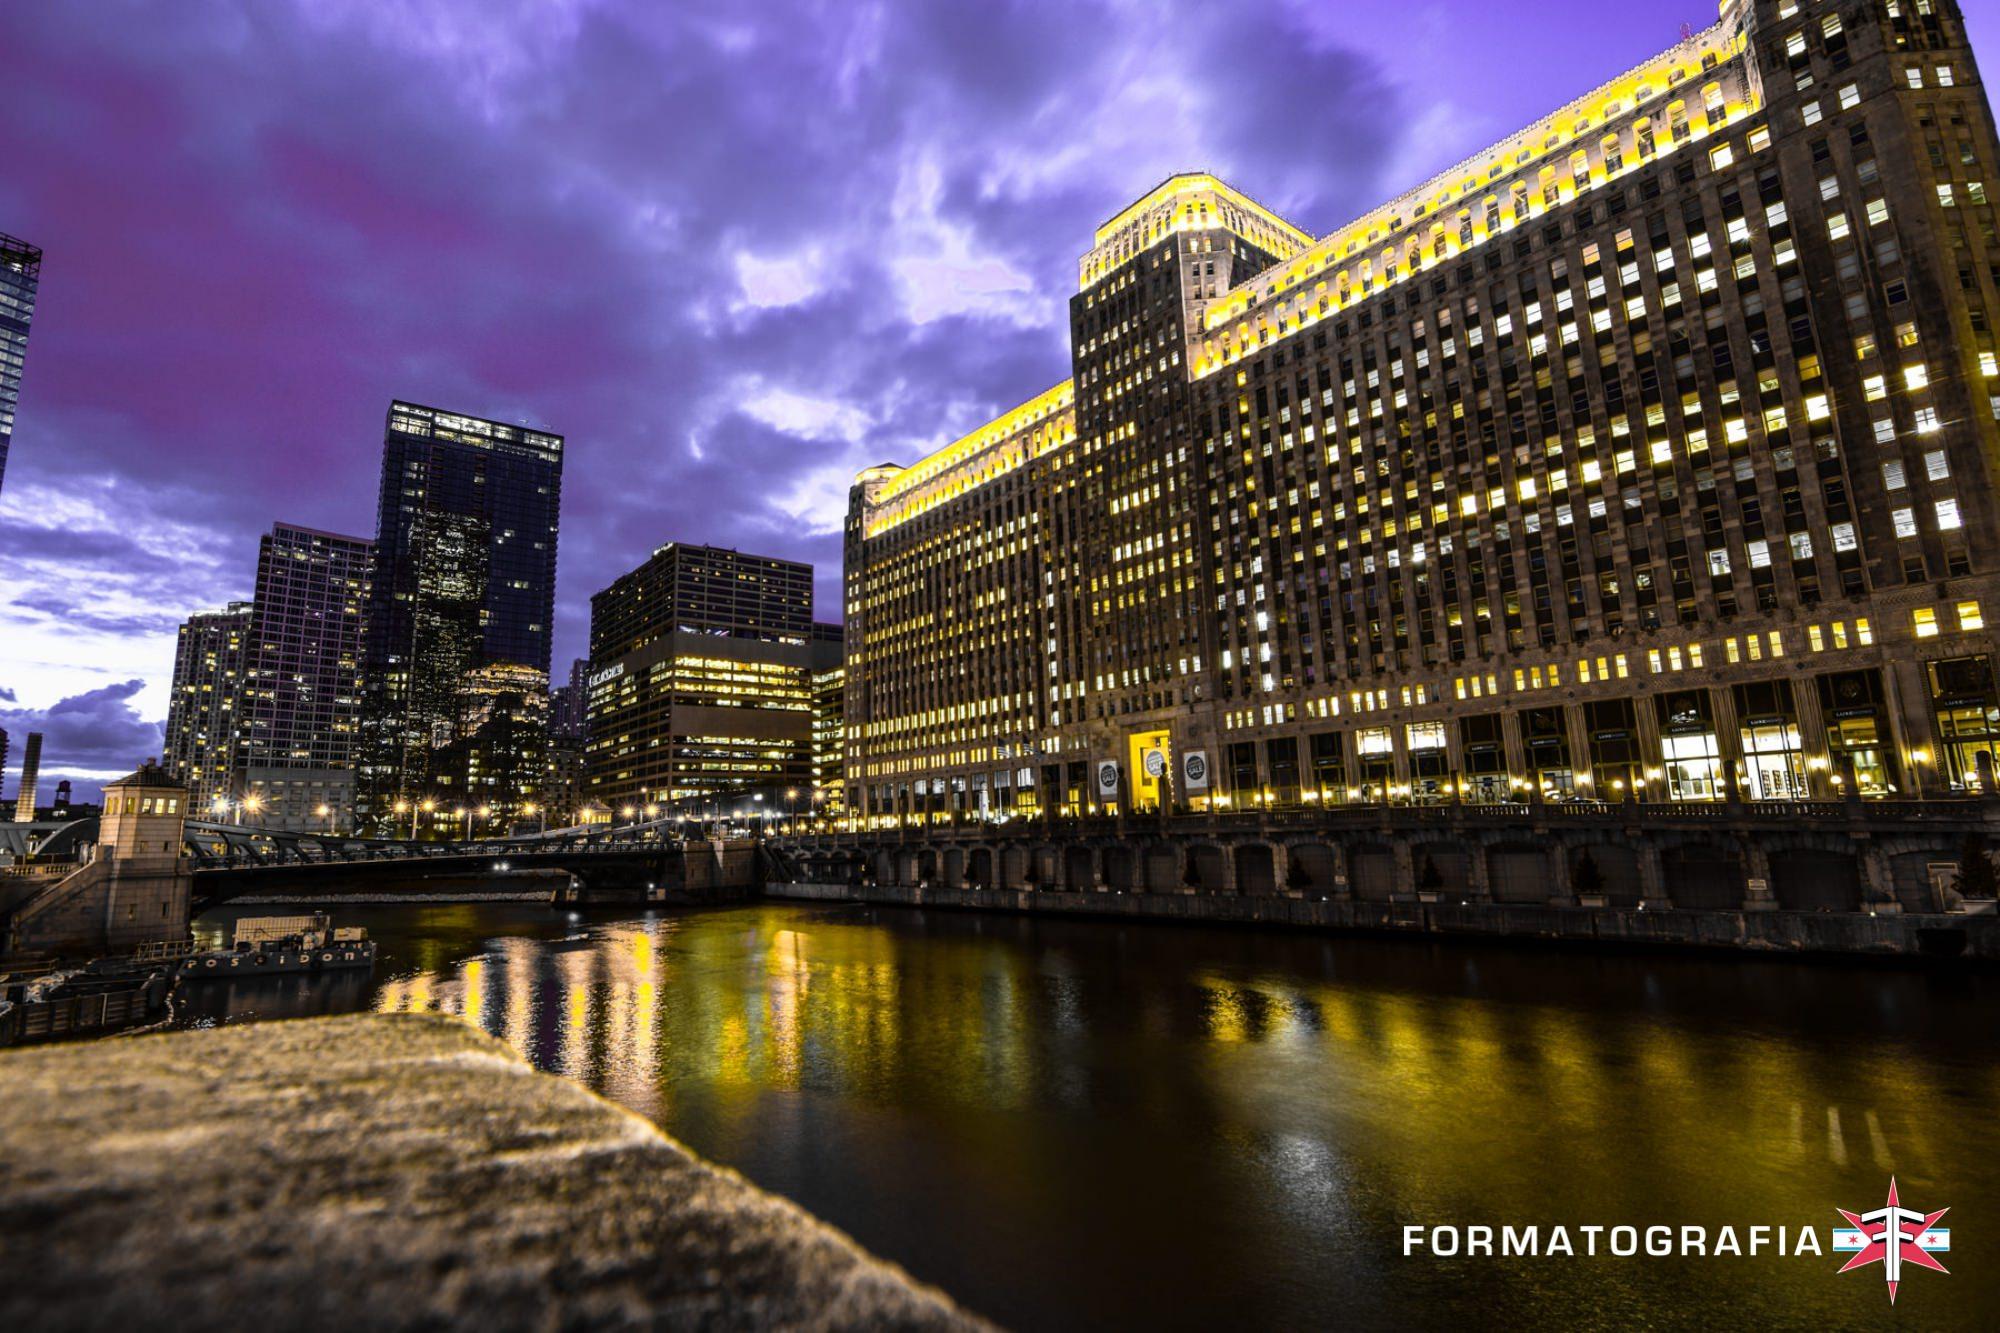 eric formato chicago photographer fall update city architecture shotsDSC_0051-2.jpg